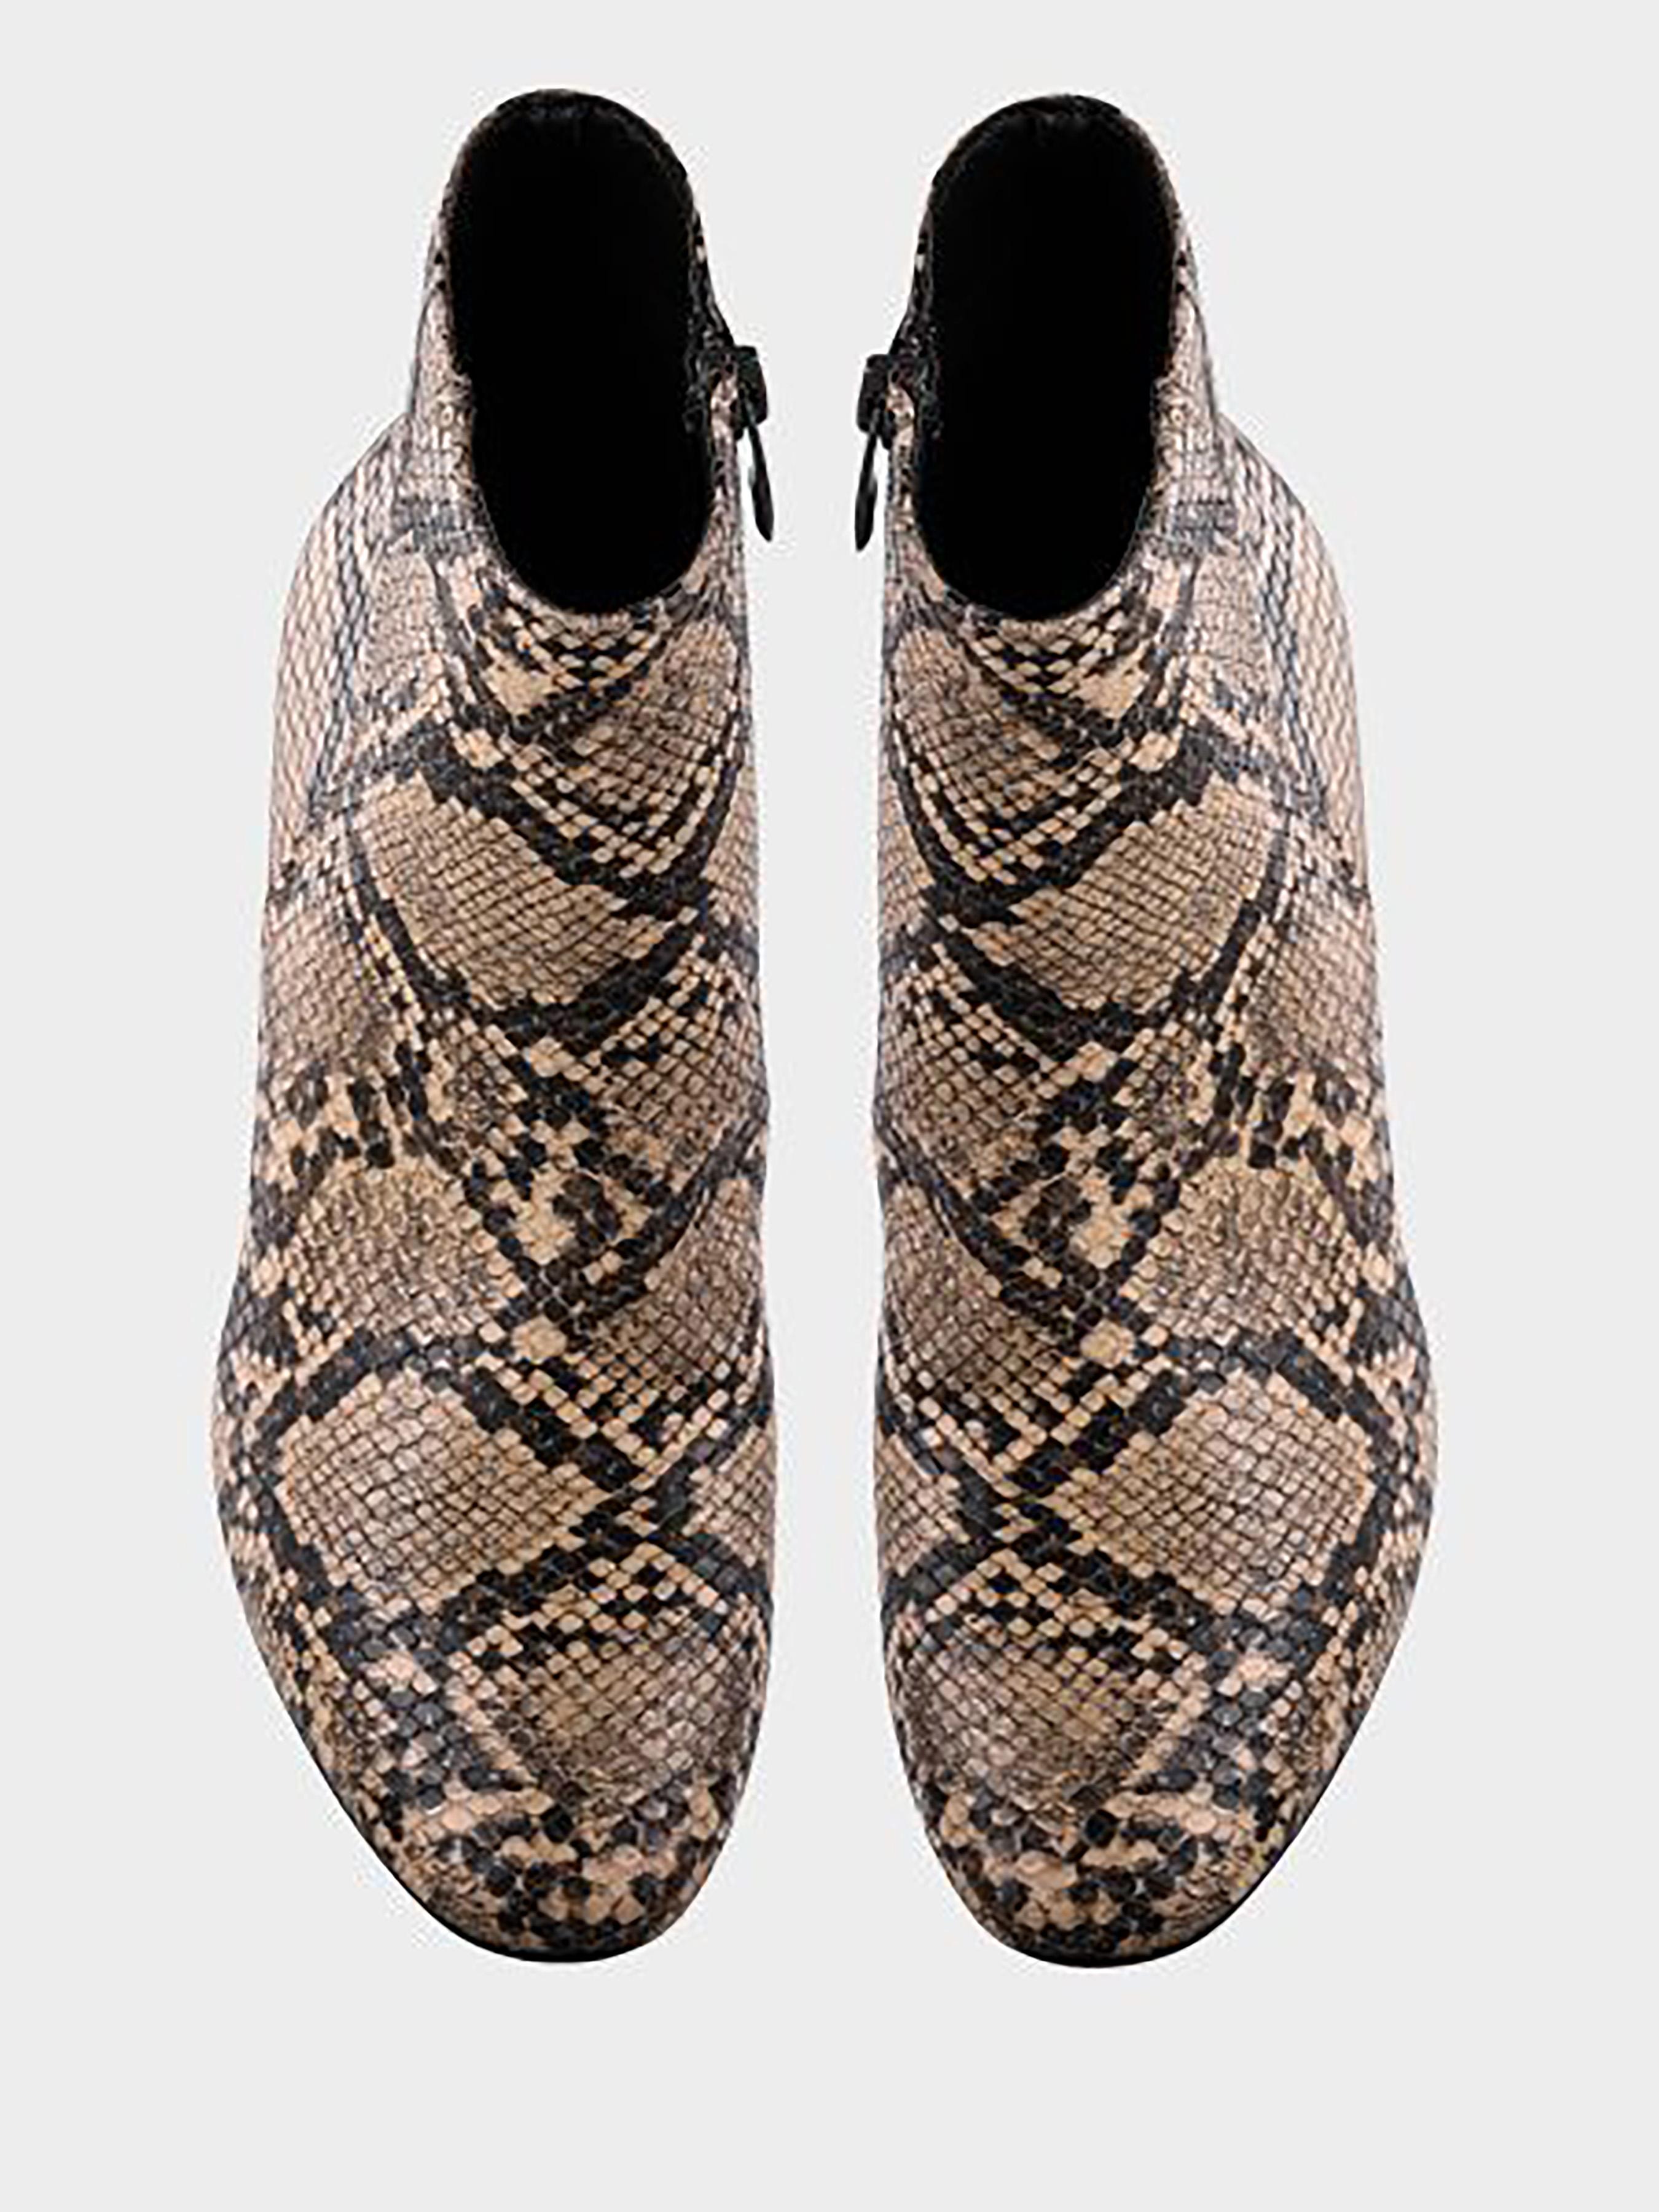 Ботинки женские M Wone OI150 цена, 2017